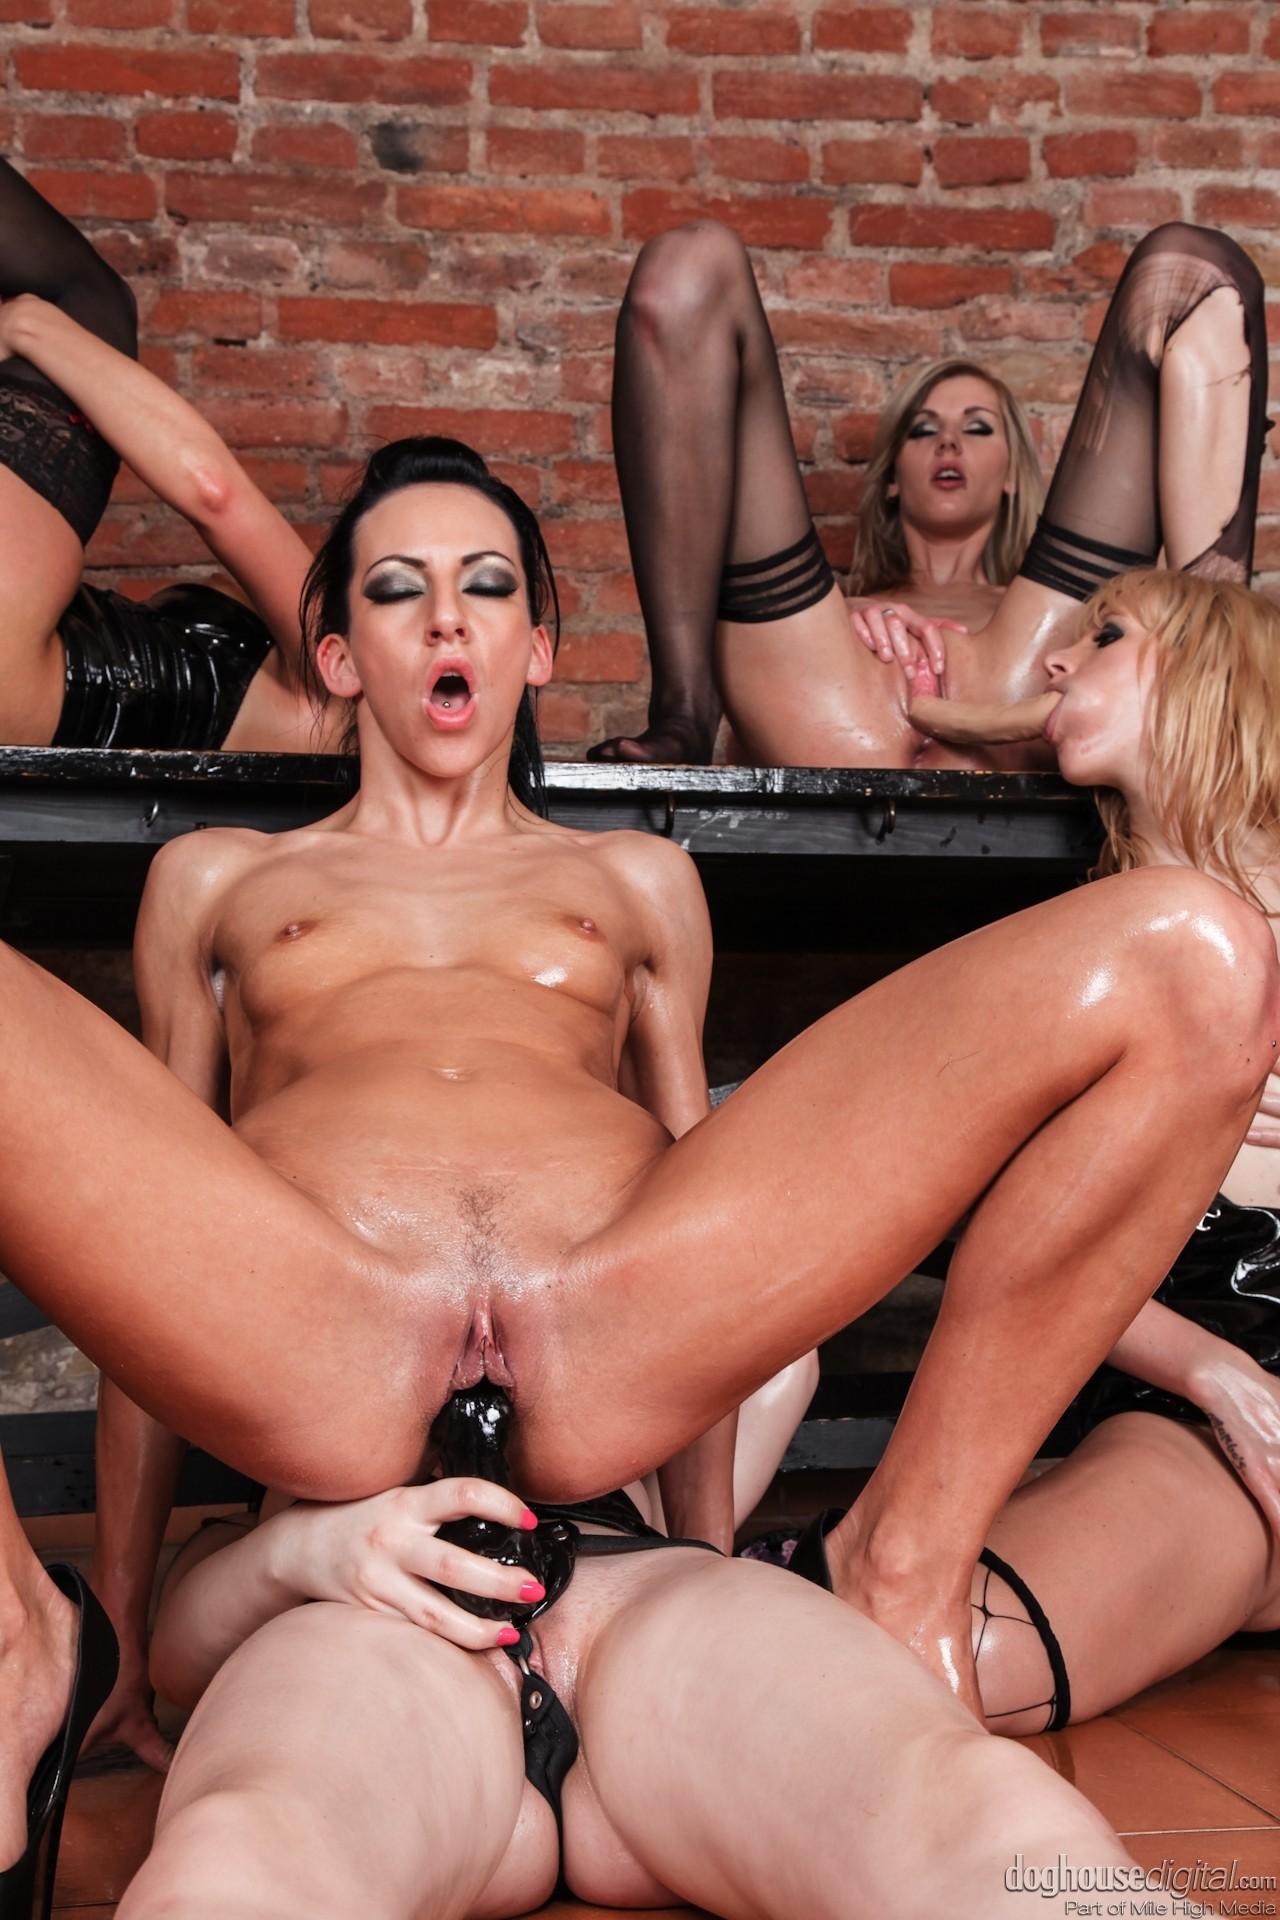 women-dildo-orgy-strap